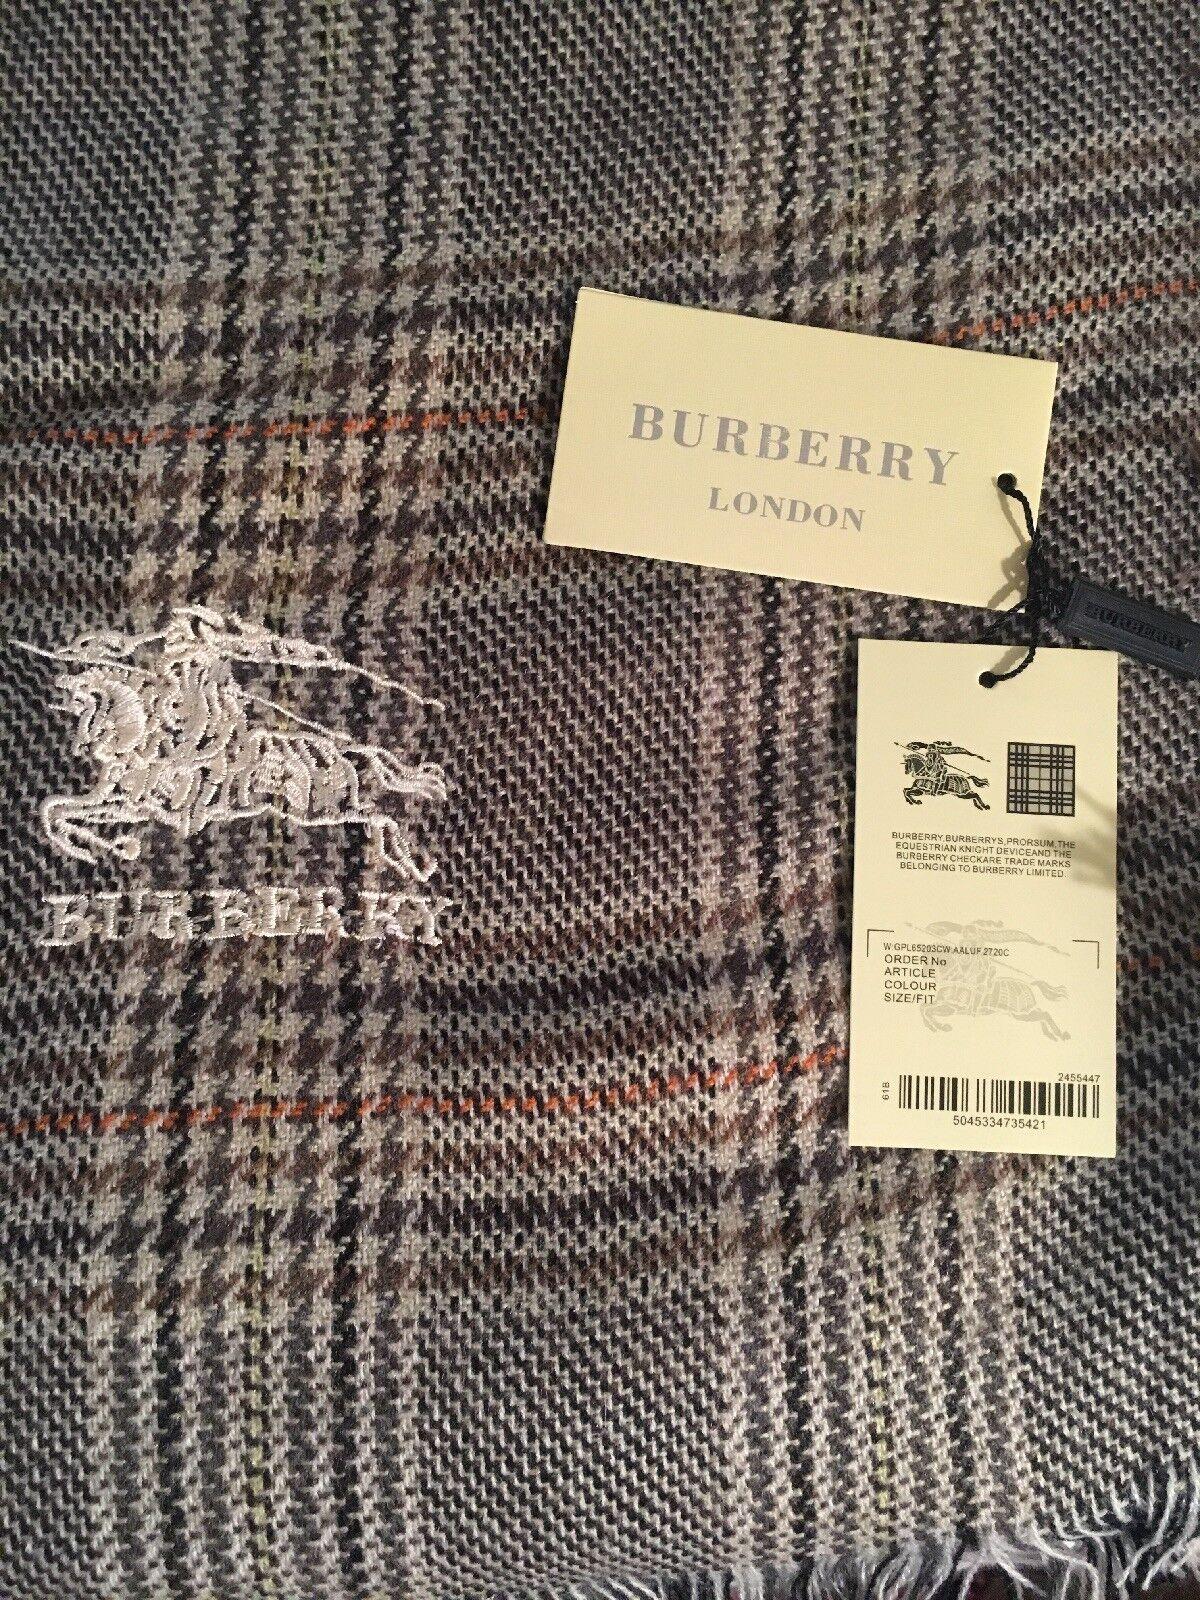 Burberry Scarf Tag : burberry, scarf, BURBERRY, Scarf, Plaid, Check, Cashmere, Scotland, 81x31, LUVLUV, Online